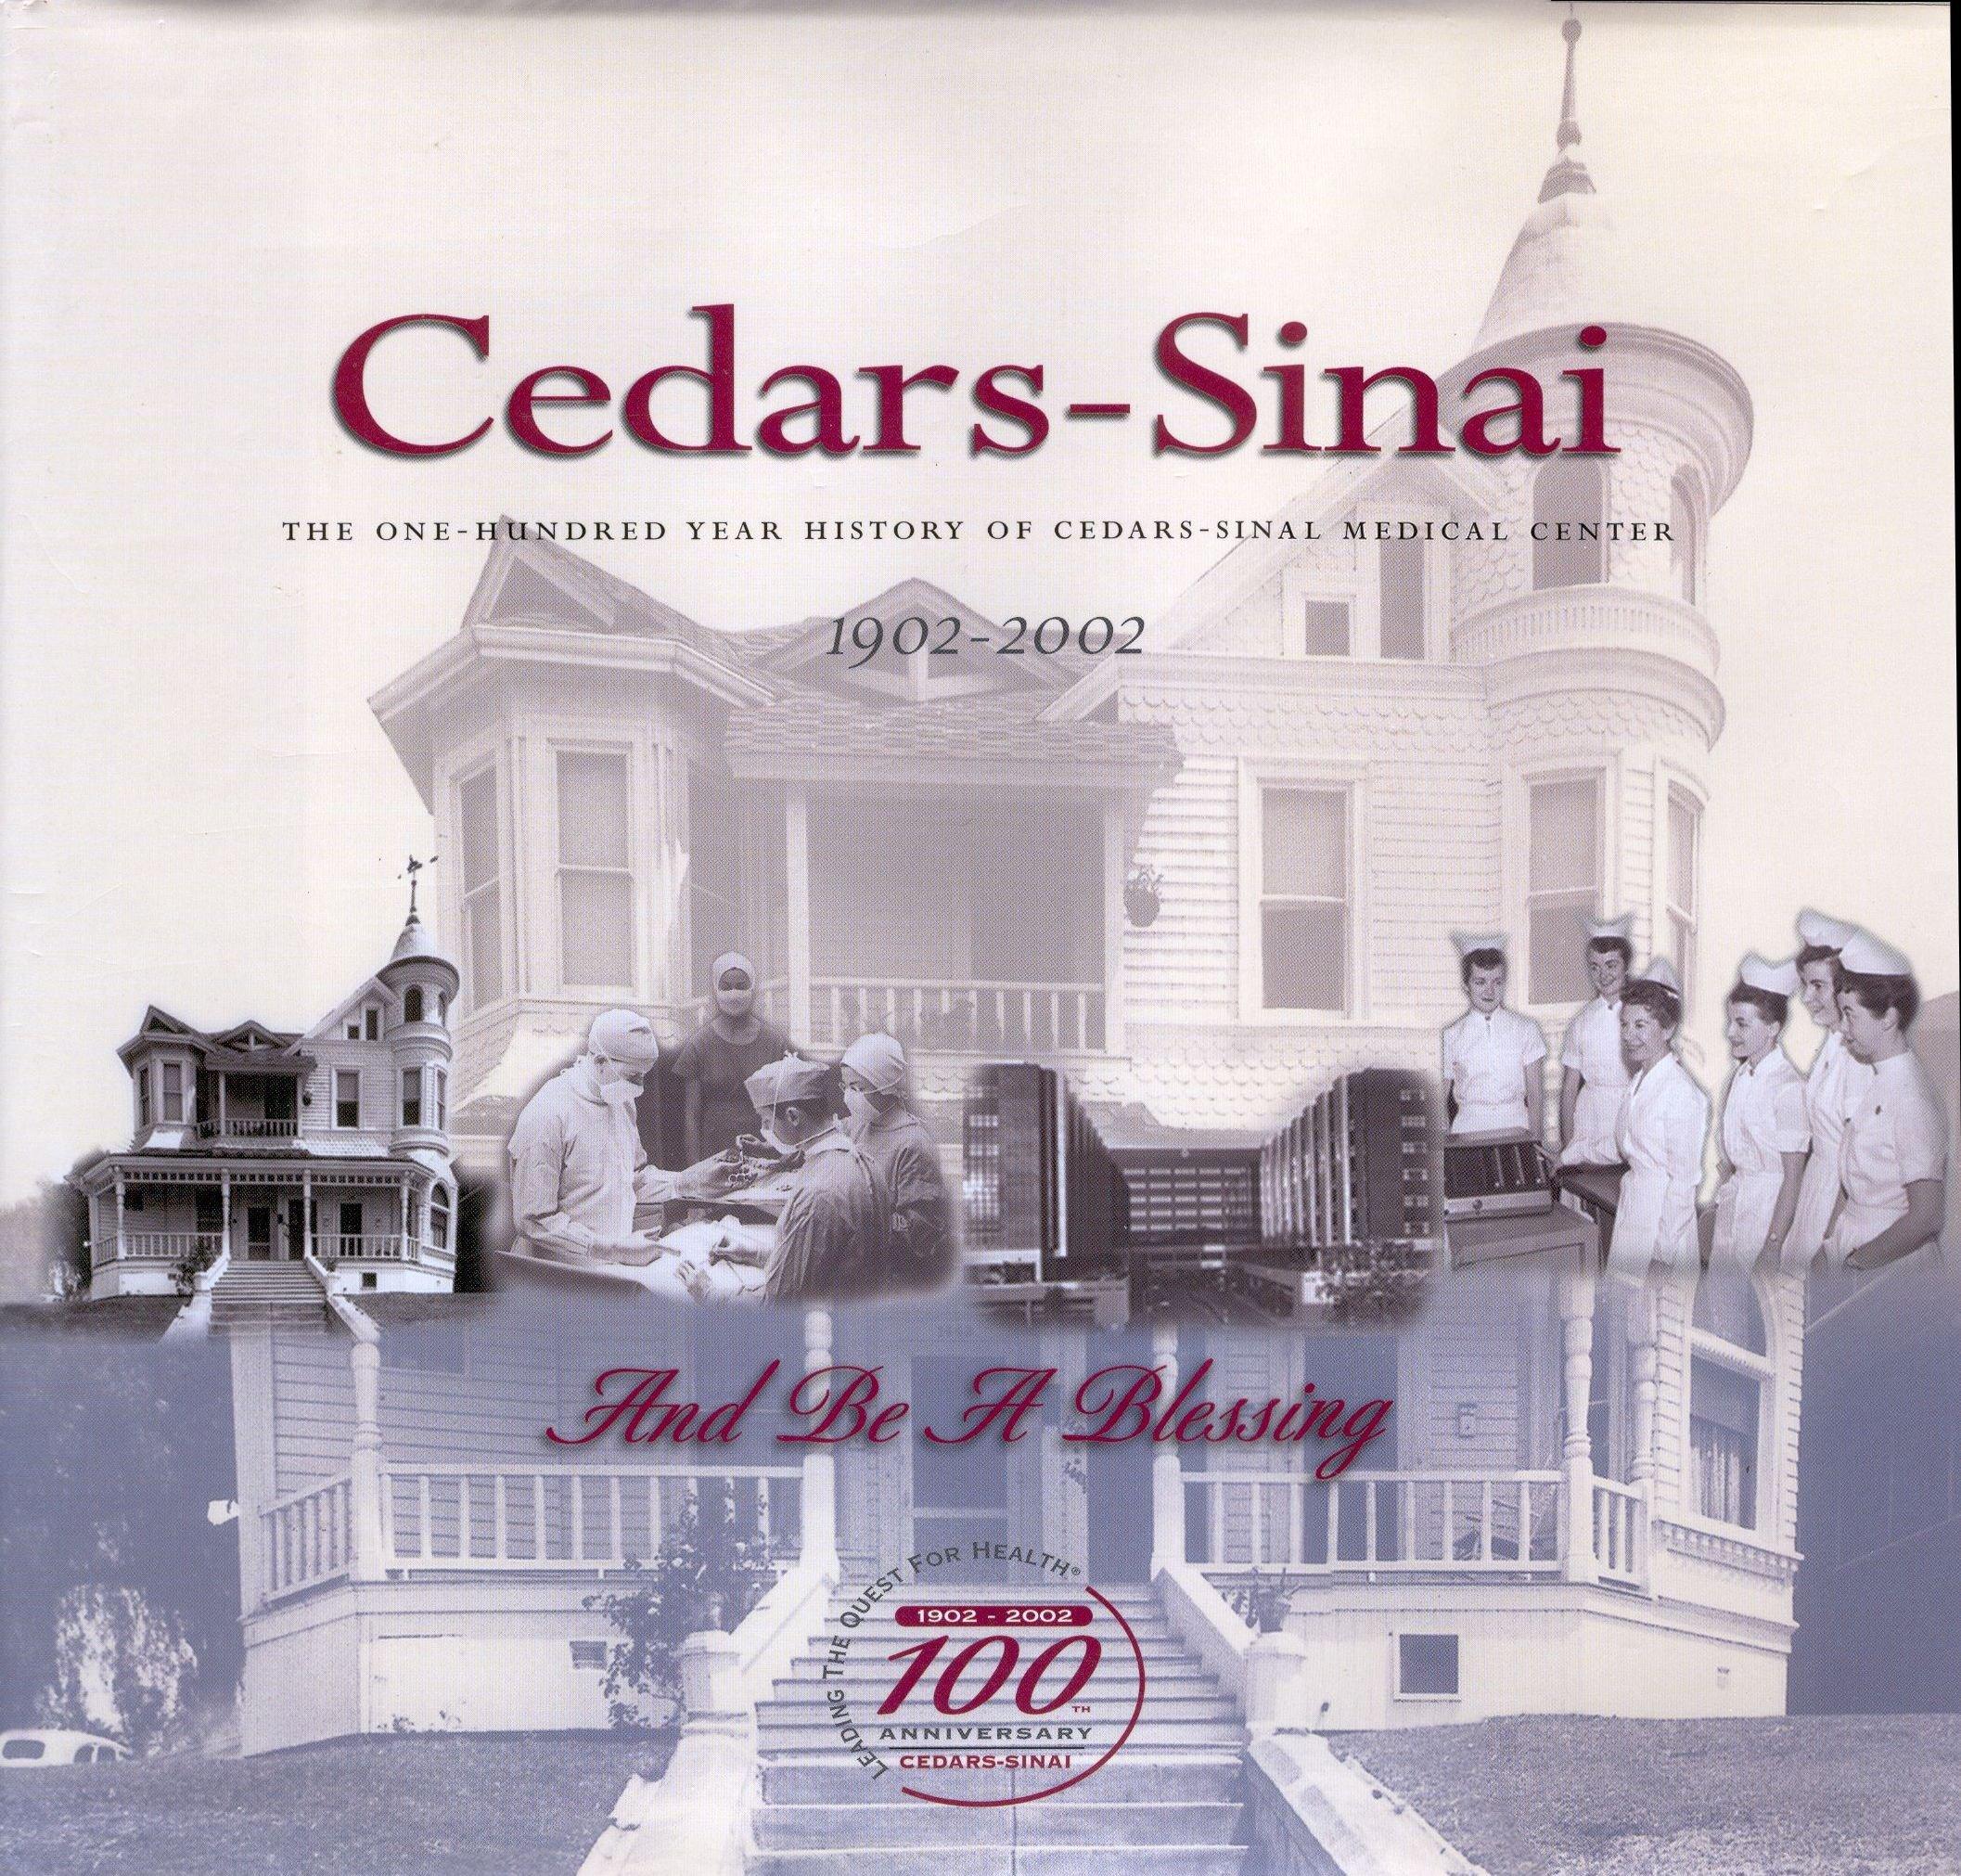 Cedars-Sinai: The one-hundred year history of Cedars-Sinai